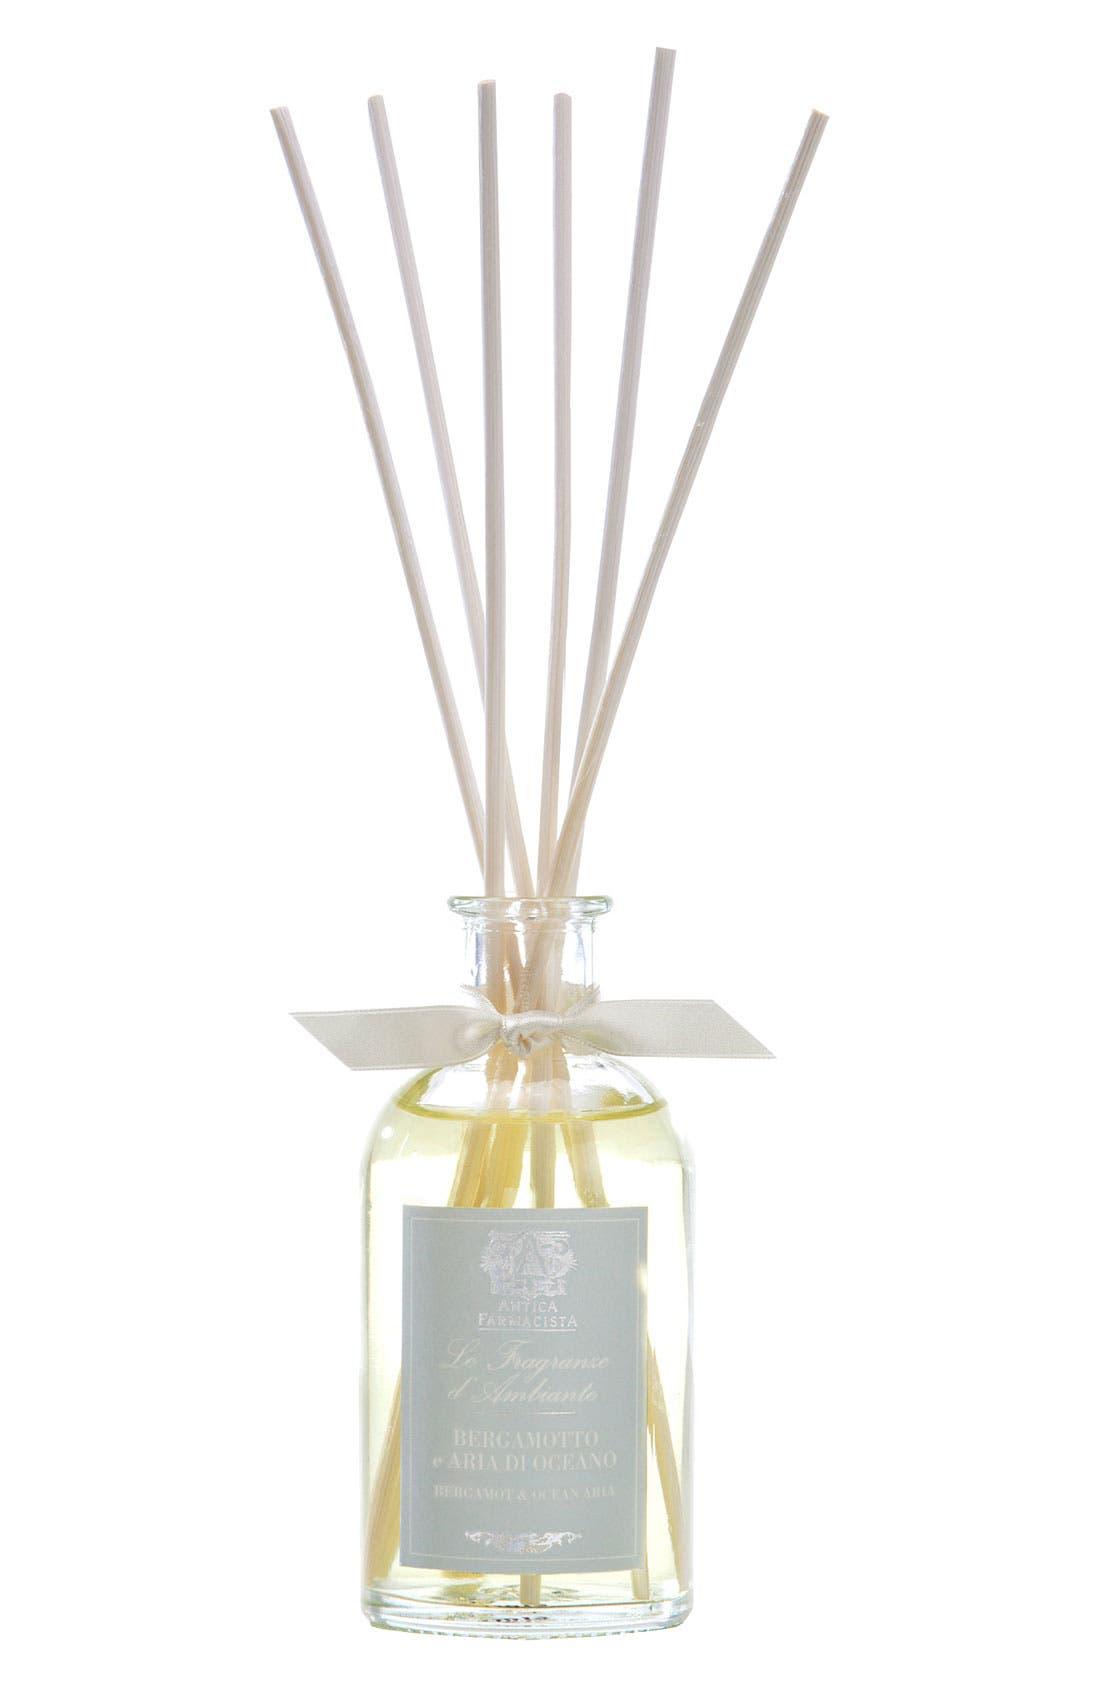 Alternate Image 1 Selected - Antica Farmacista 'Bergamot & Ocean Aria' Home Ambiance Perfume (3.3 oz.)